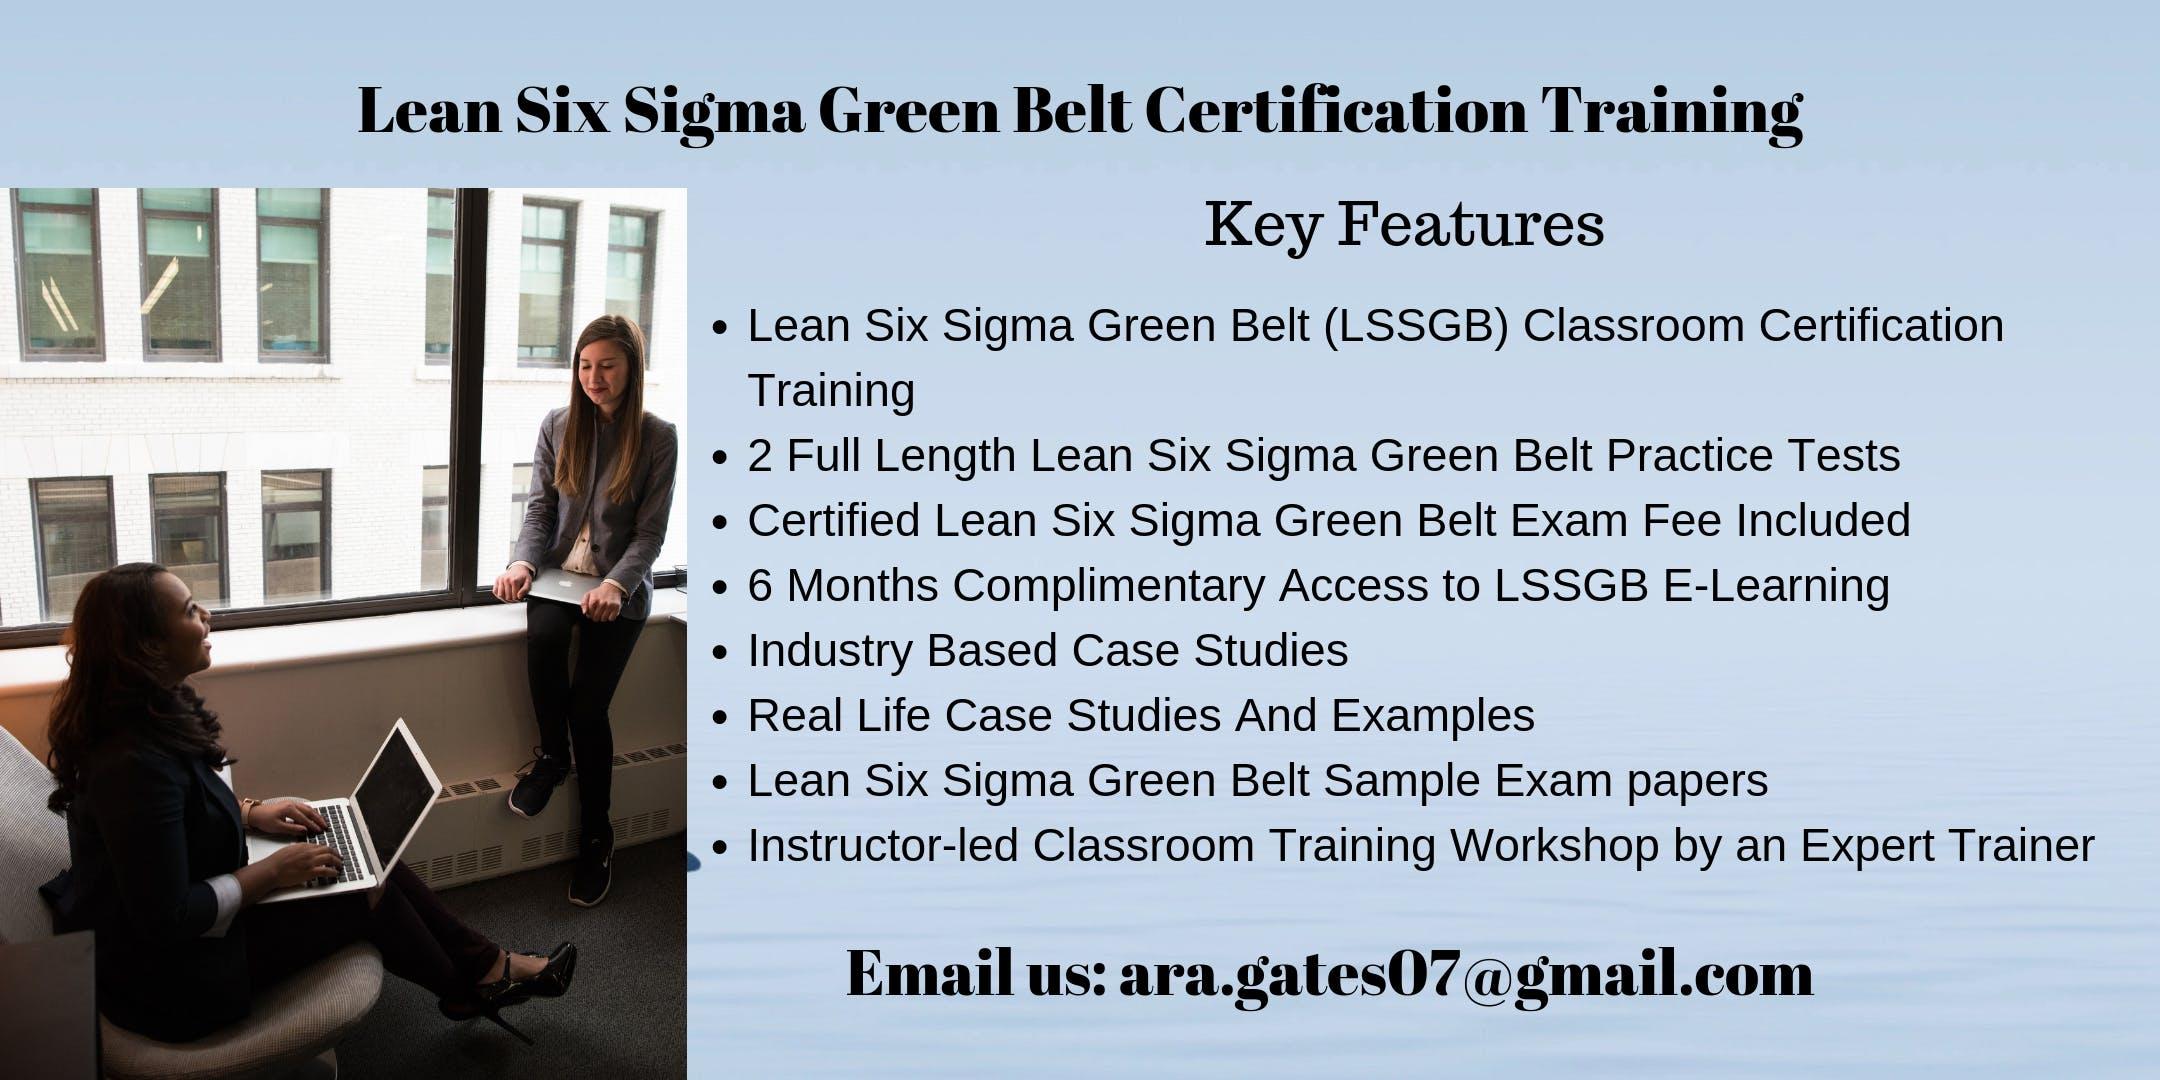 LSSGB Certification Course in Mesa, AZ